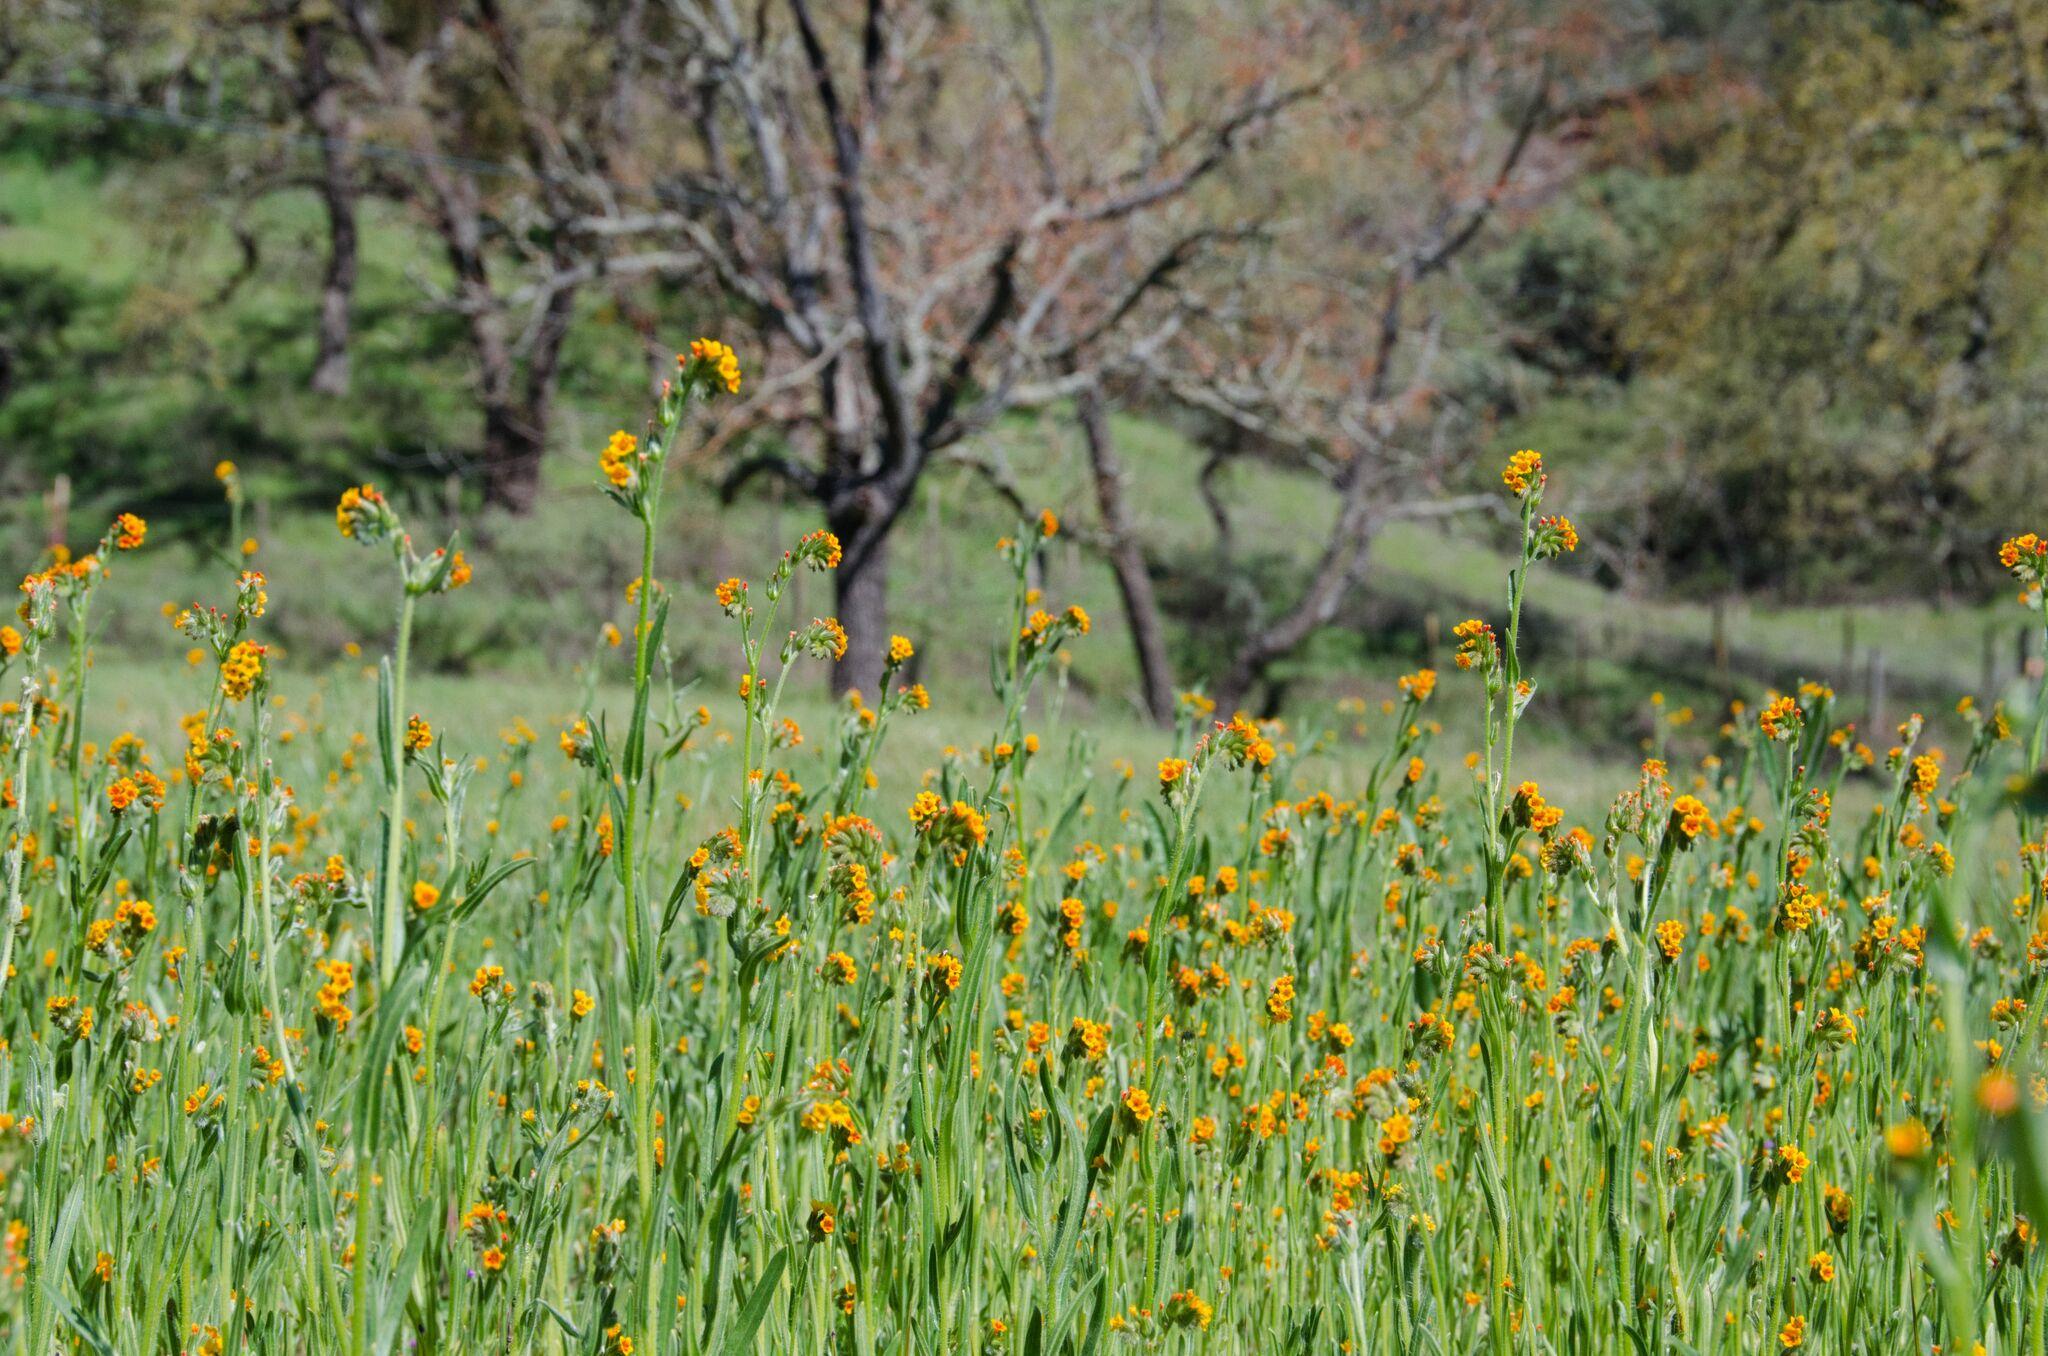 Llagas-Creek-Loop-Trail_Rancho-Canada-del-Oro-Open-Space-Preserve_Cassie-Kifer-11_preview